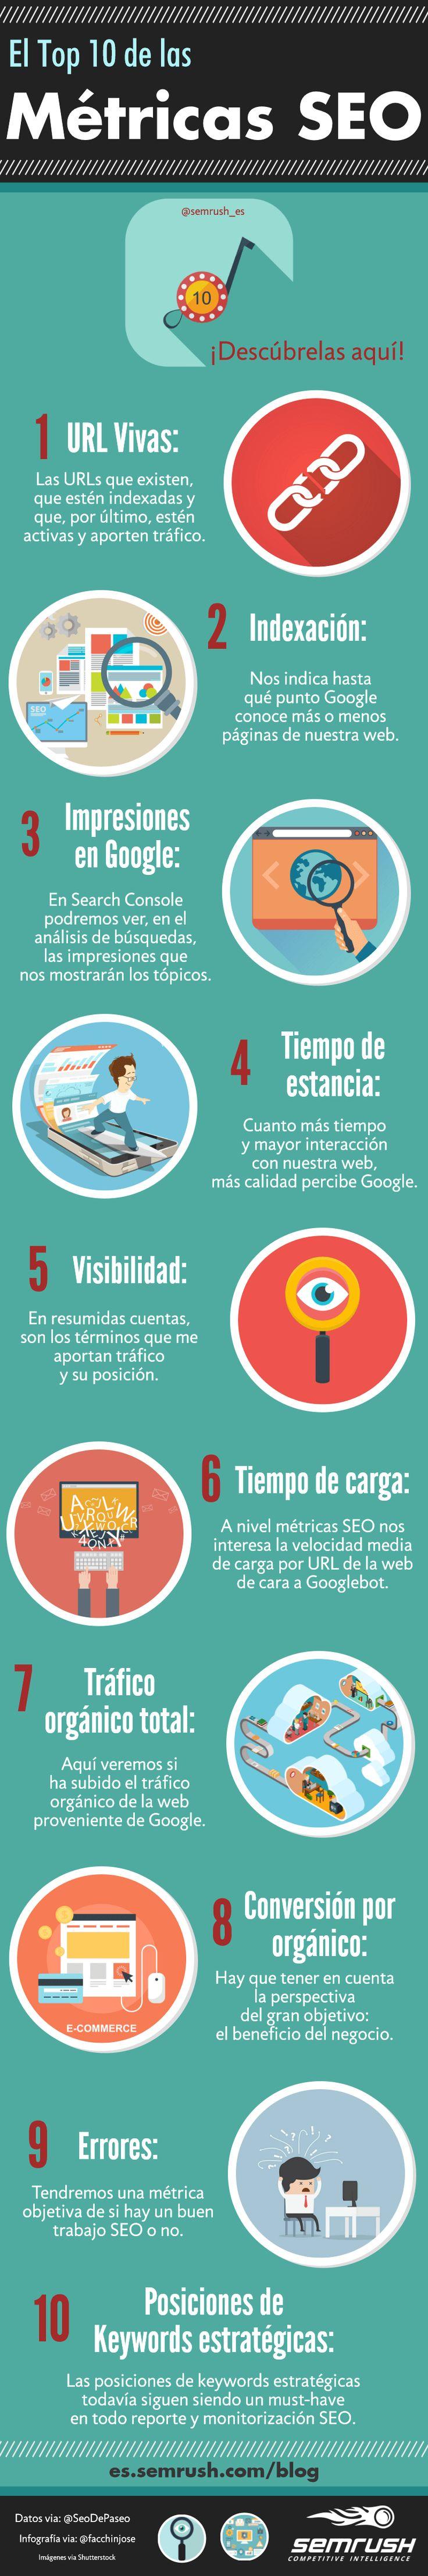 Top 10 métricas SEO #infografia #infographic #seo | TICs y Formación